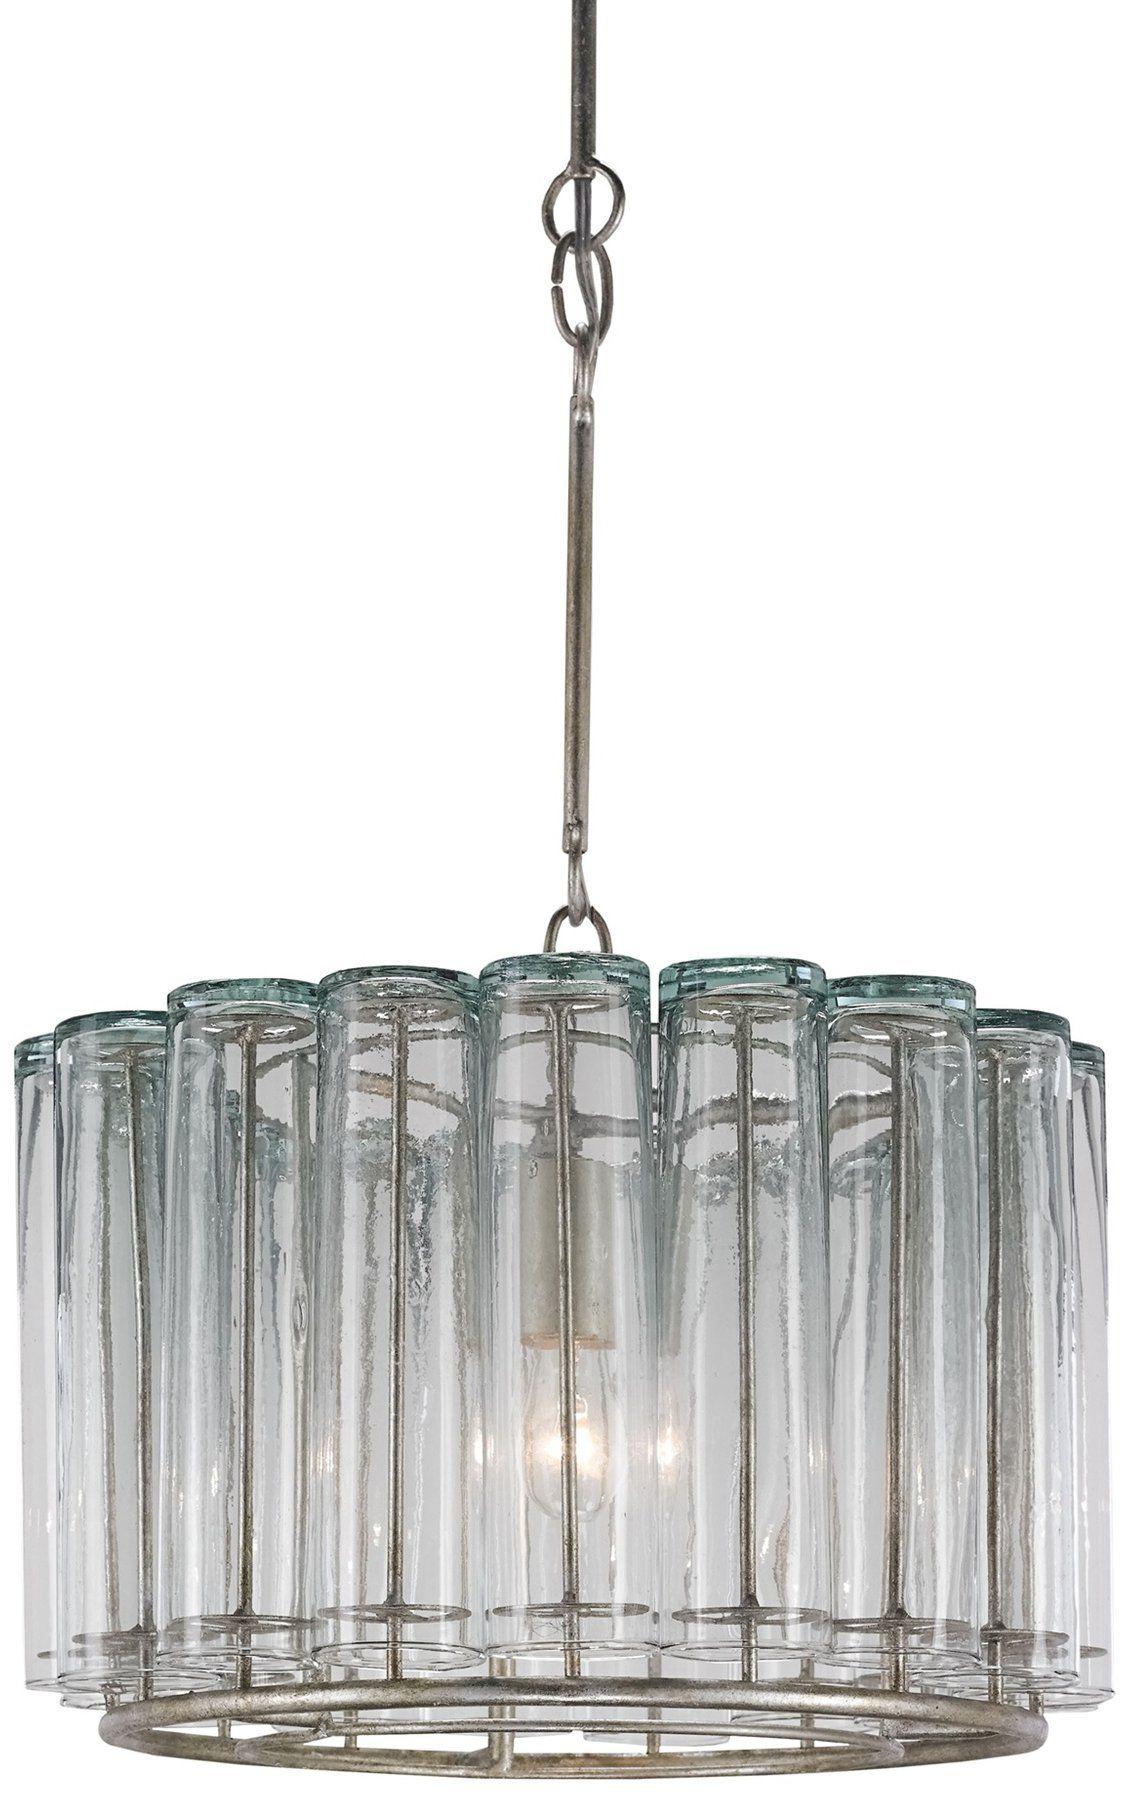 Habitations interior design currey and company 9375 - Interior design lighting companies ...